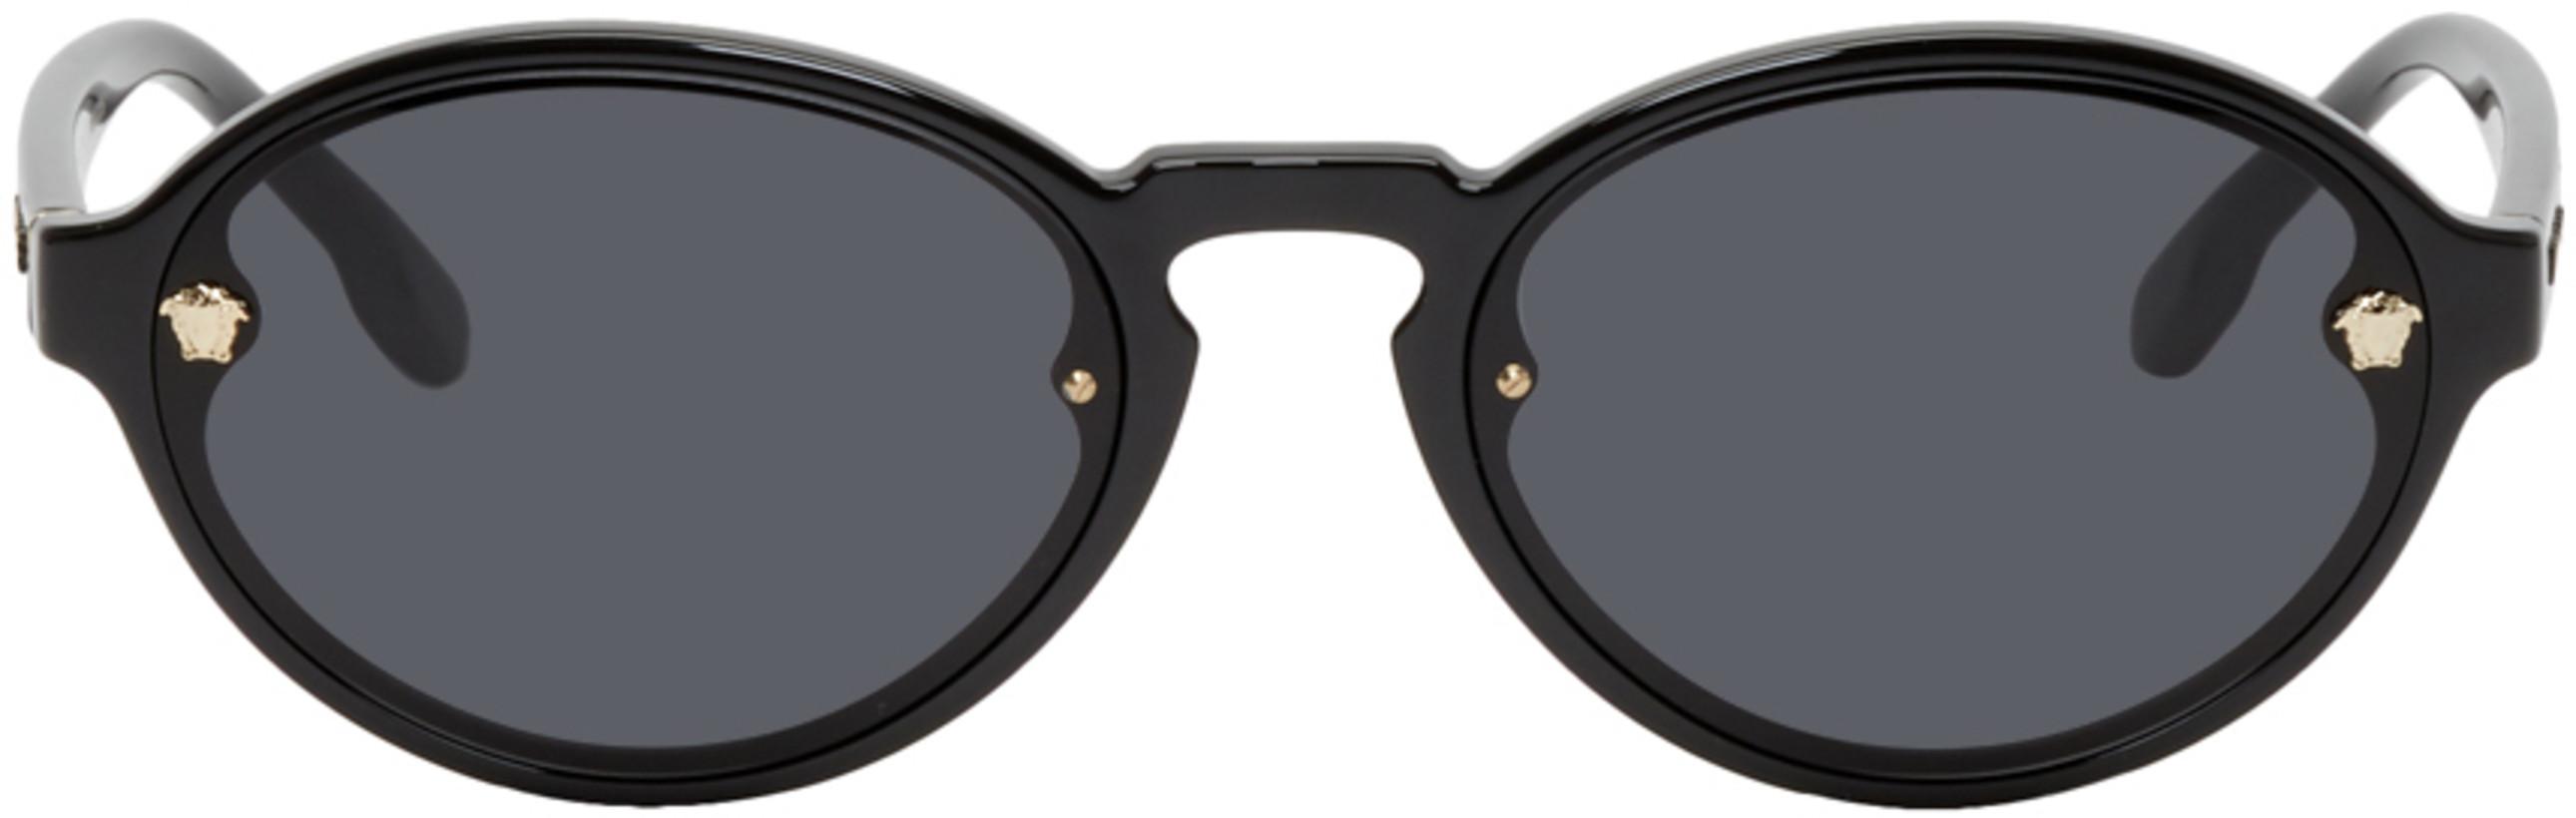 Versace Black Oval Sunglasses